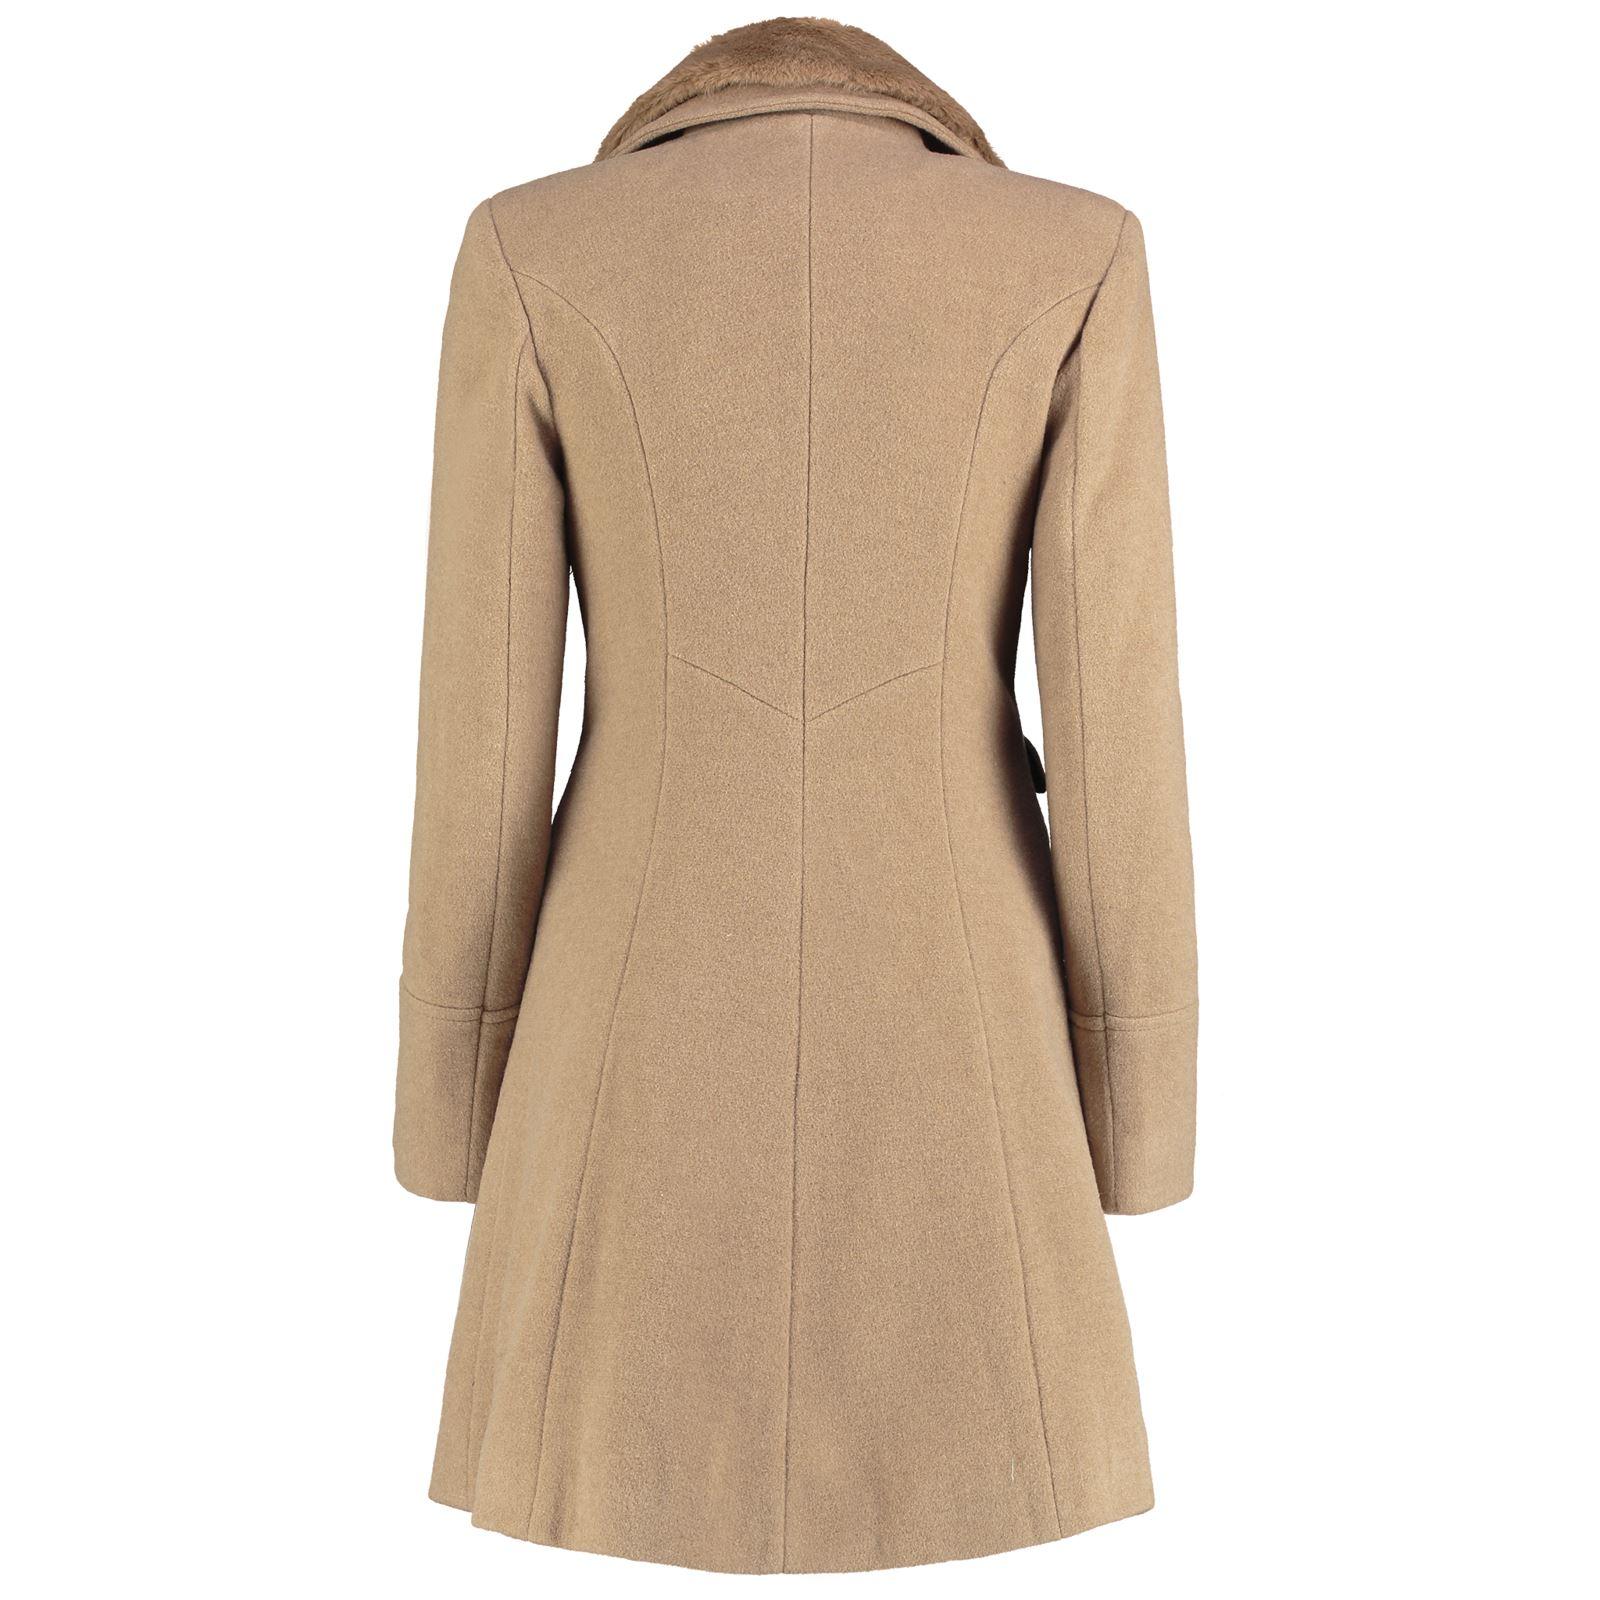 De-La-Creme-Womens-Wool-Blend-Faux-Fur-Collar-Midi-Coat thumbnail 11